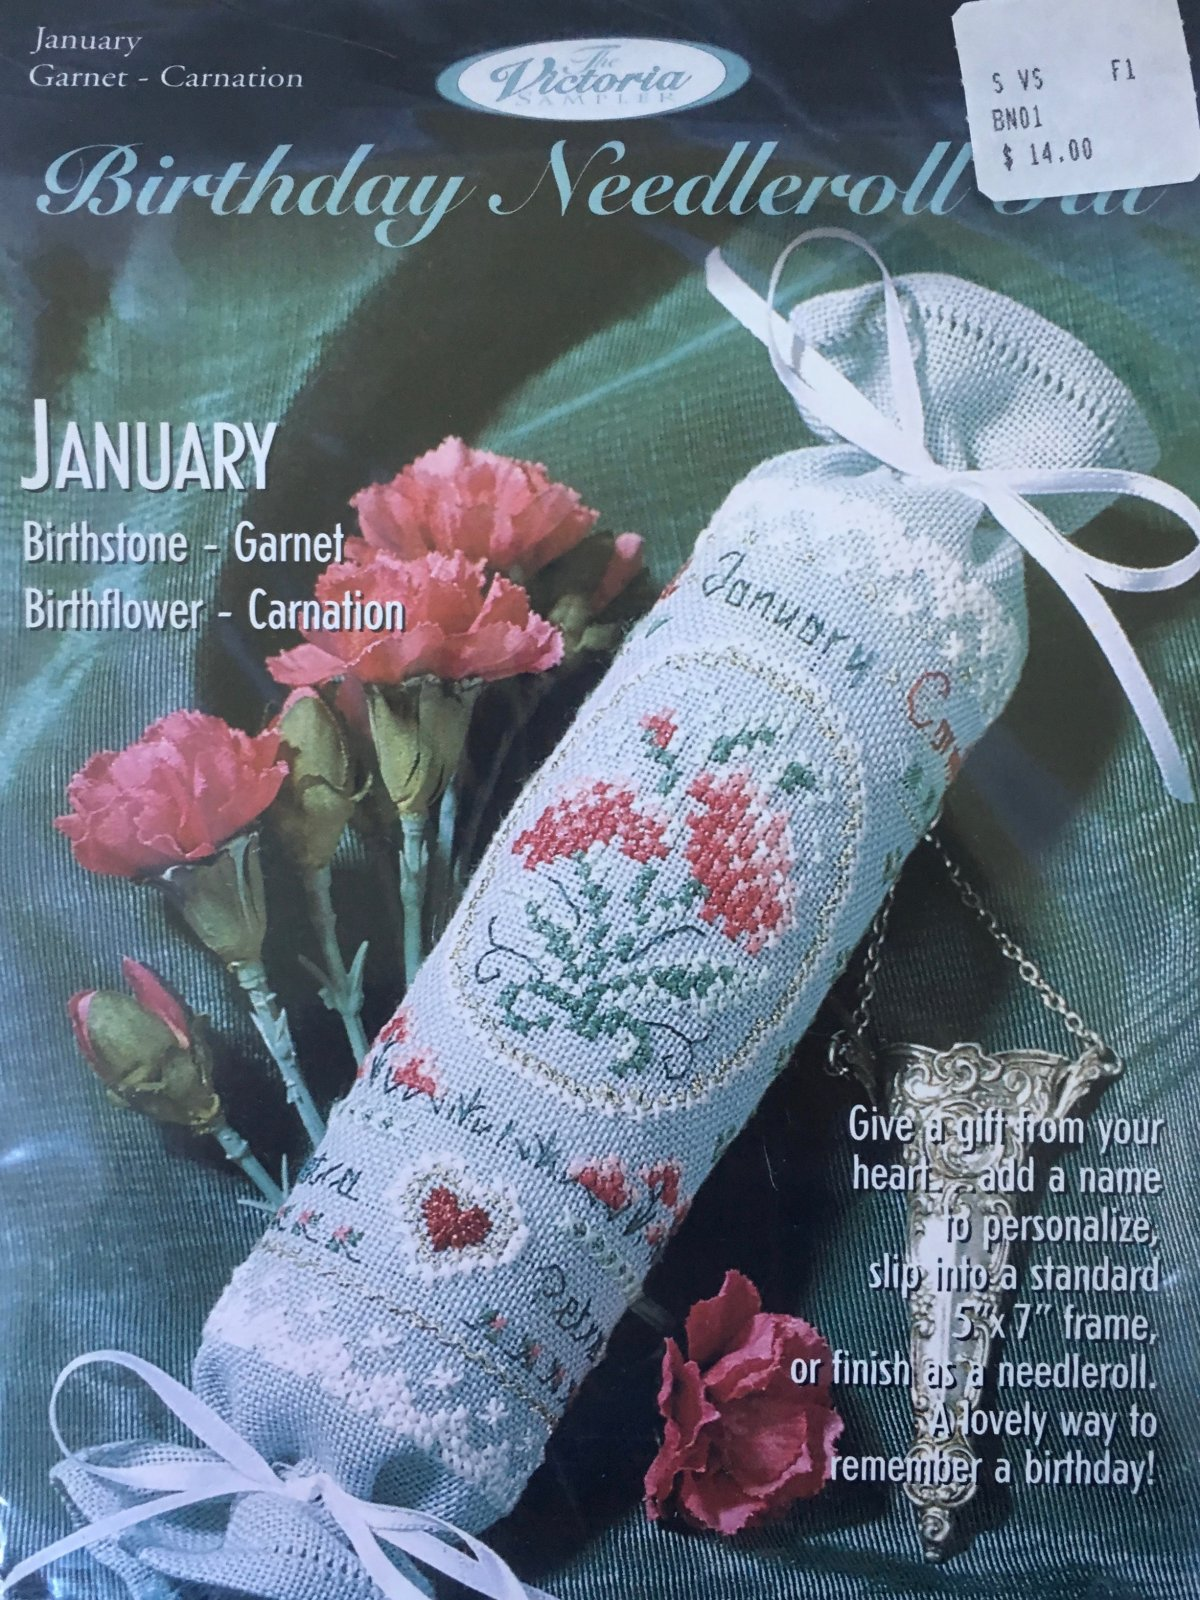 The Victoria Sampler: Birthday Needleroll Kit January BN #01